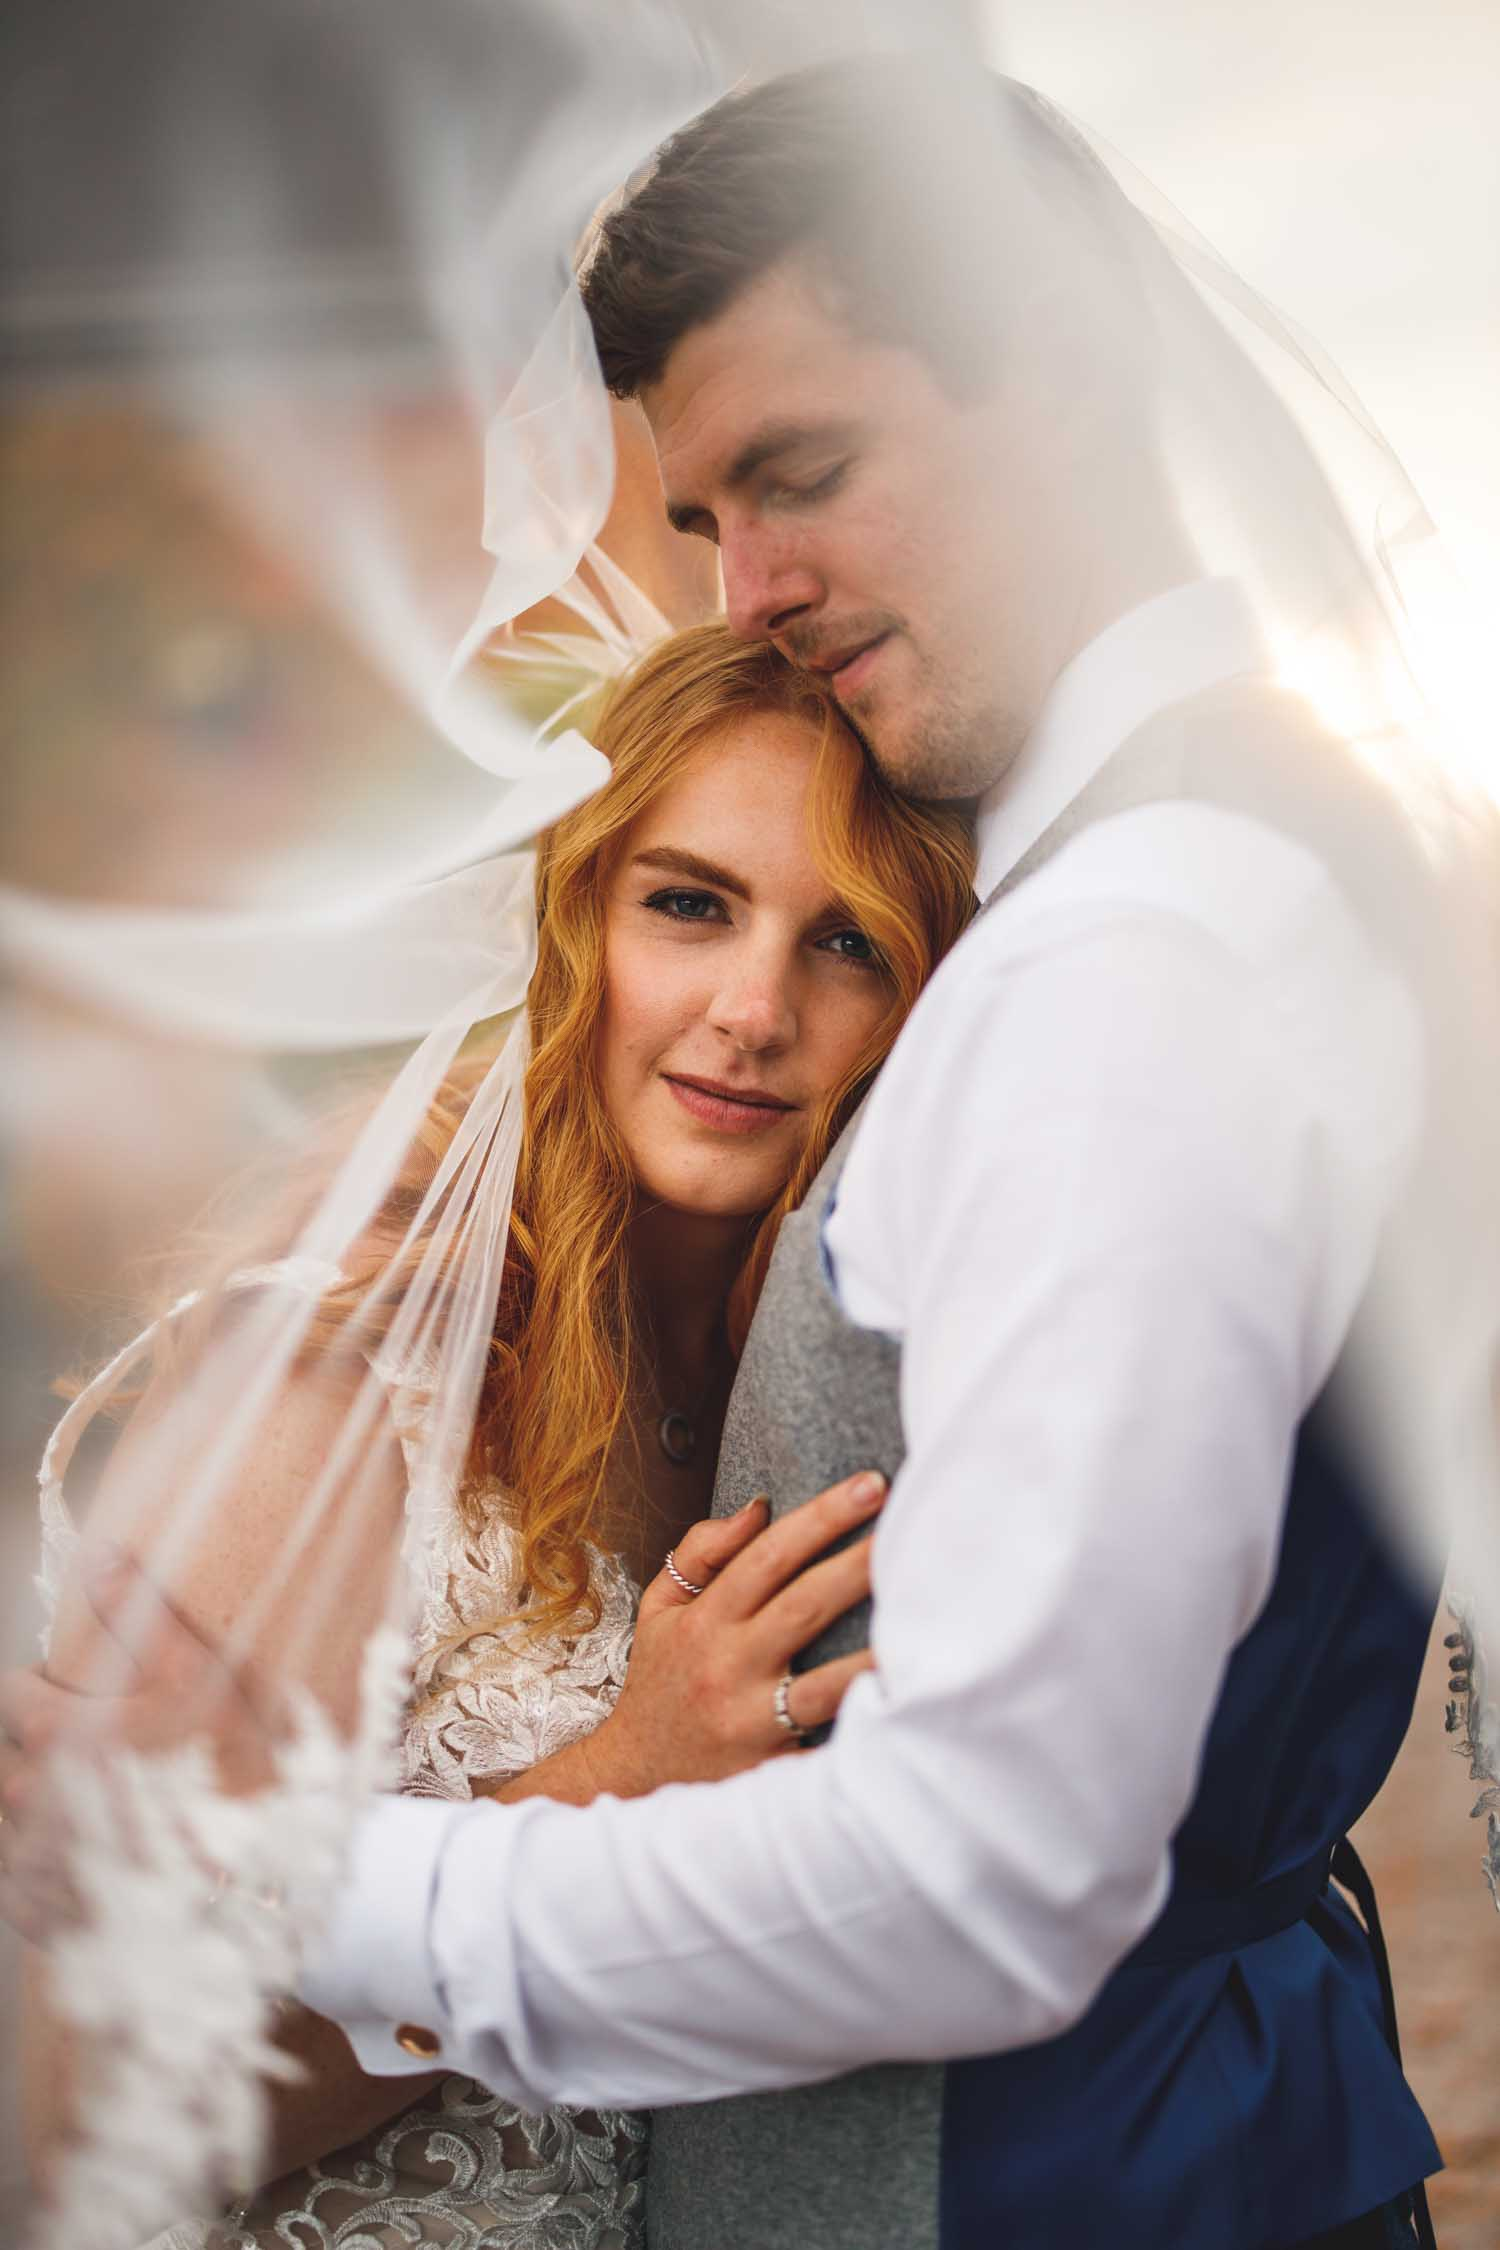 Wedding Photographer in Herefordshire, Lemore Manor Wedding, Wedding photography at Lemore Manor, Herefordshire Wedding Photographers